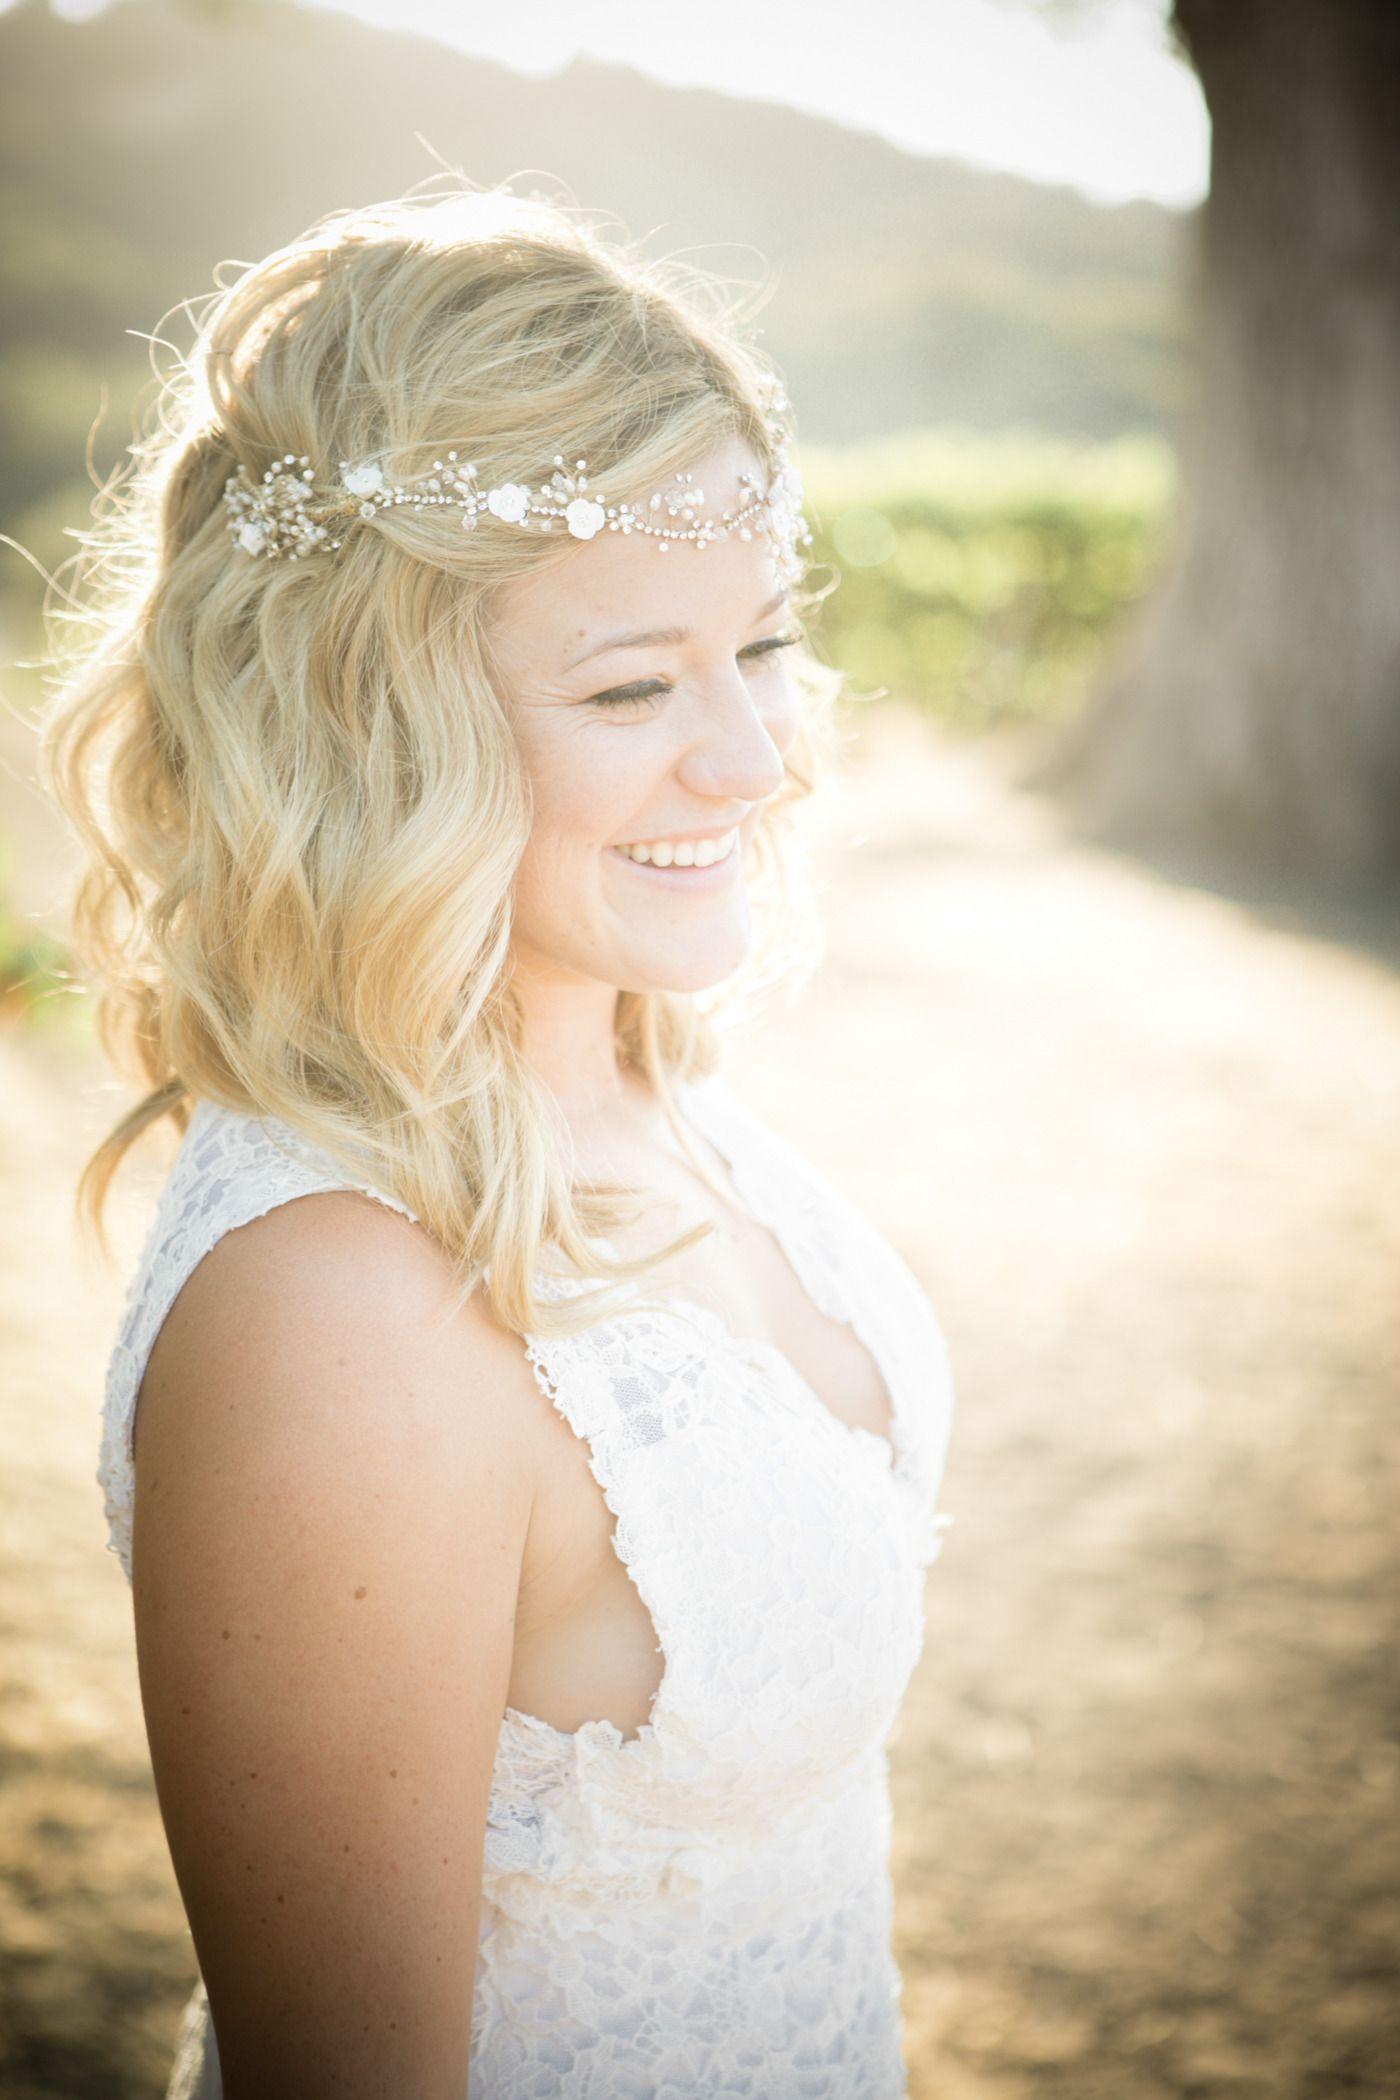 Rustic Romance at HammerSky Vineyards | California wedding, Romance ...